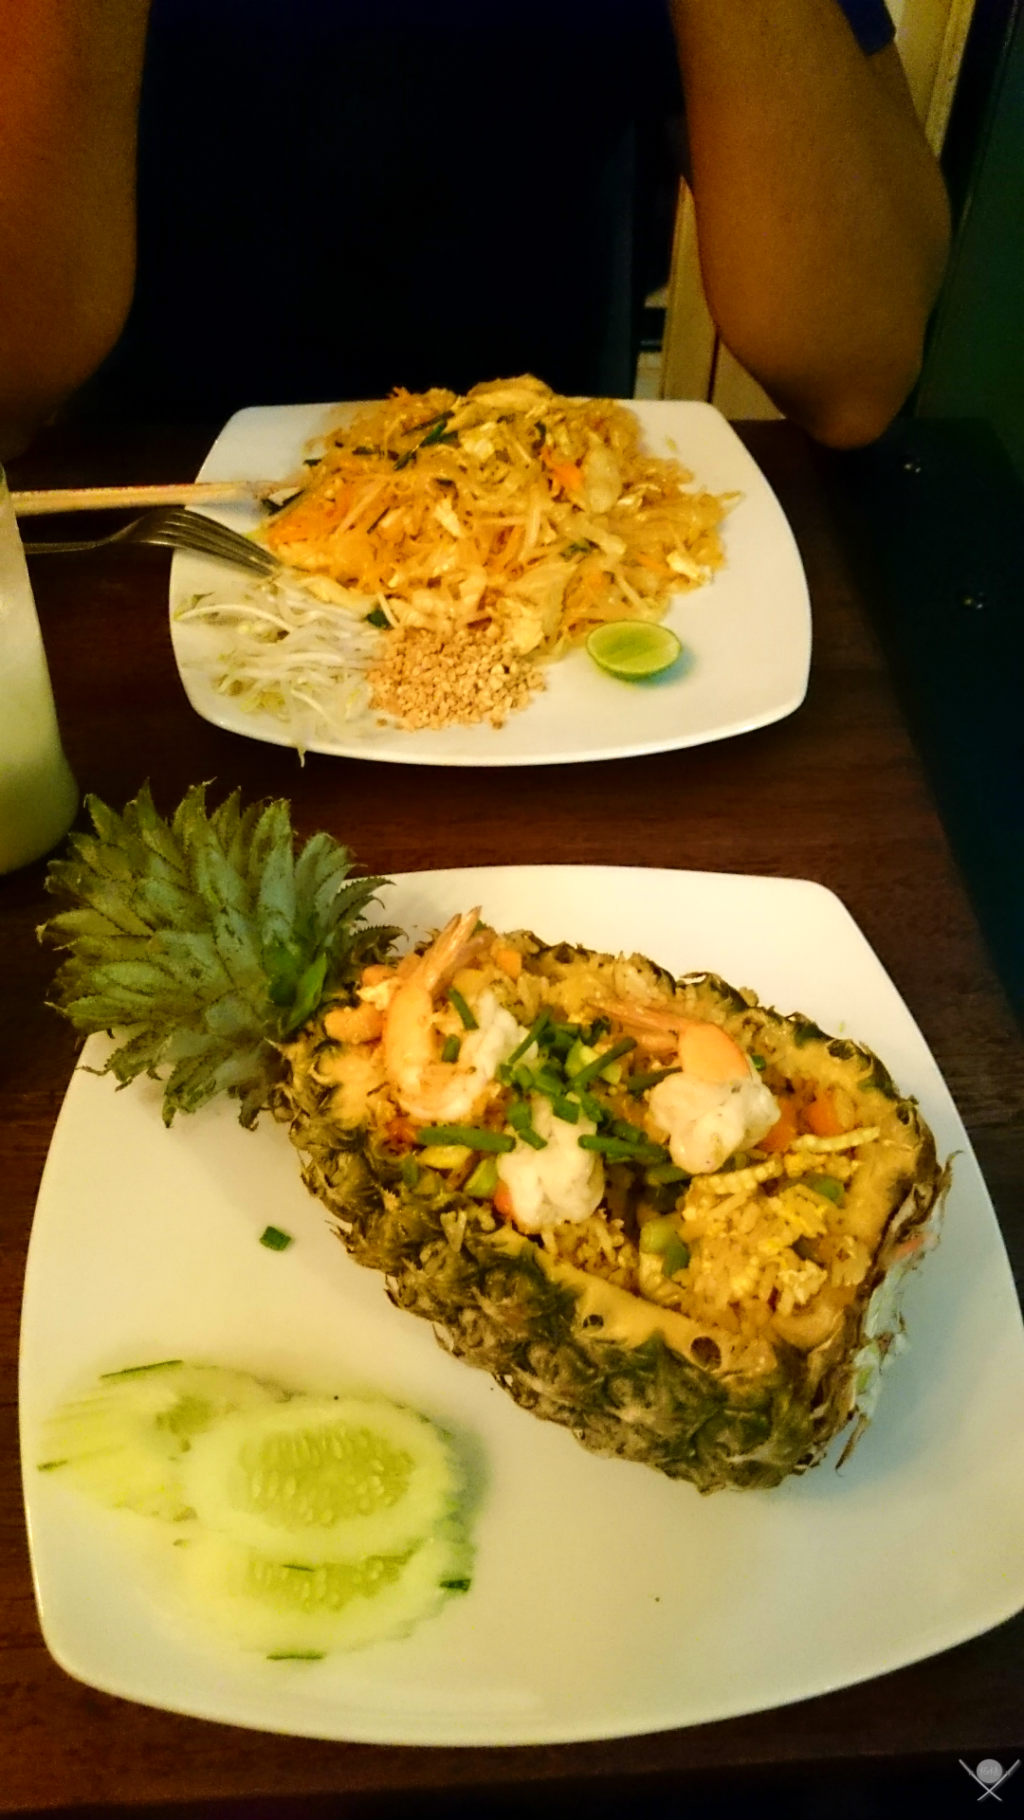 Thailand - Koh Phi Phi - Comidas abacaxi - Vida de Tsuge - VDT